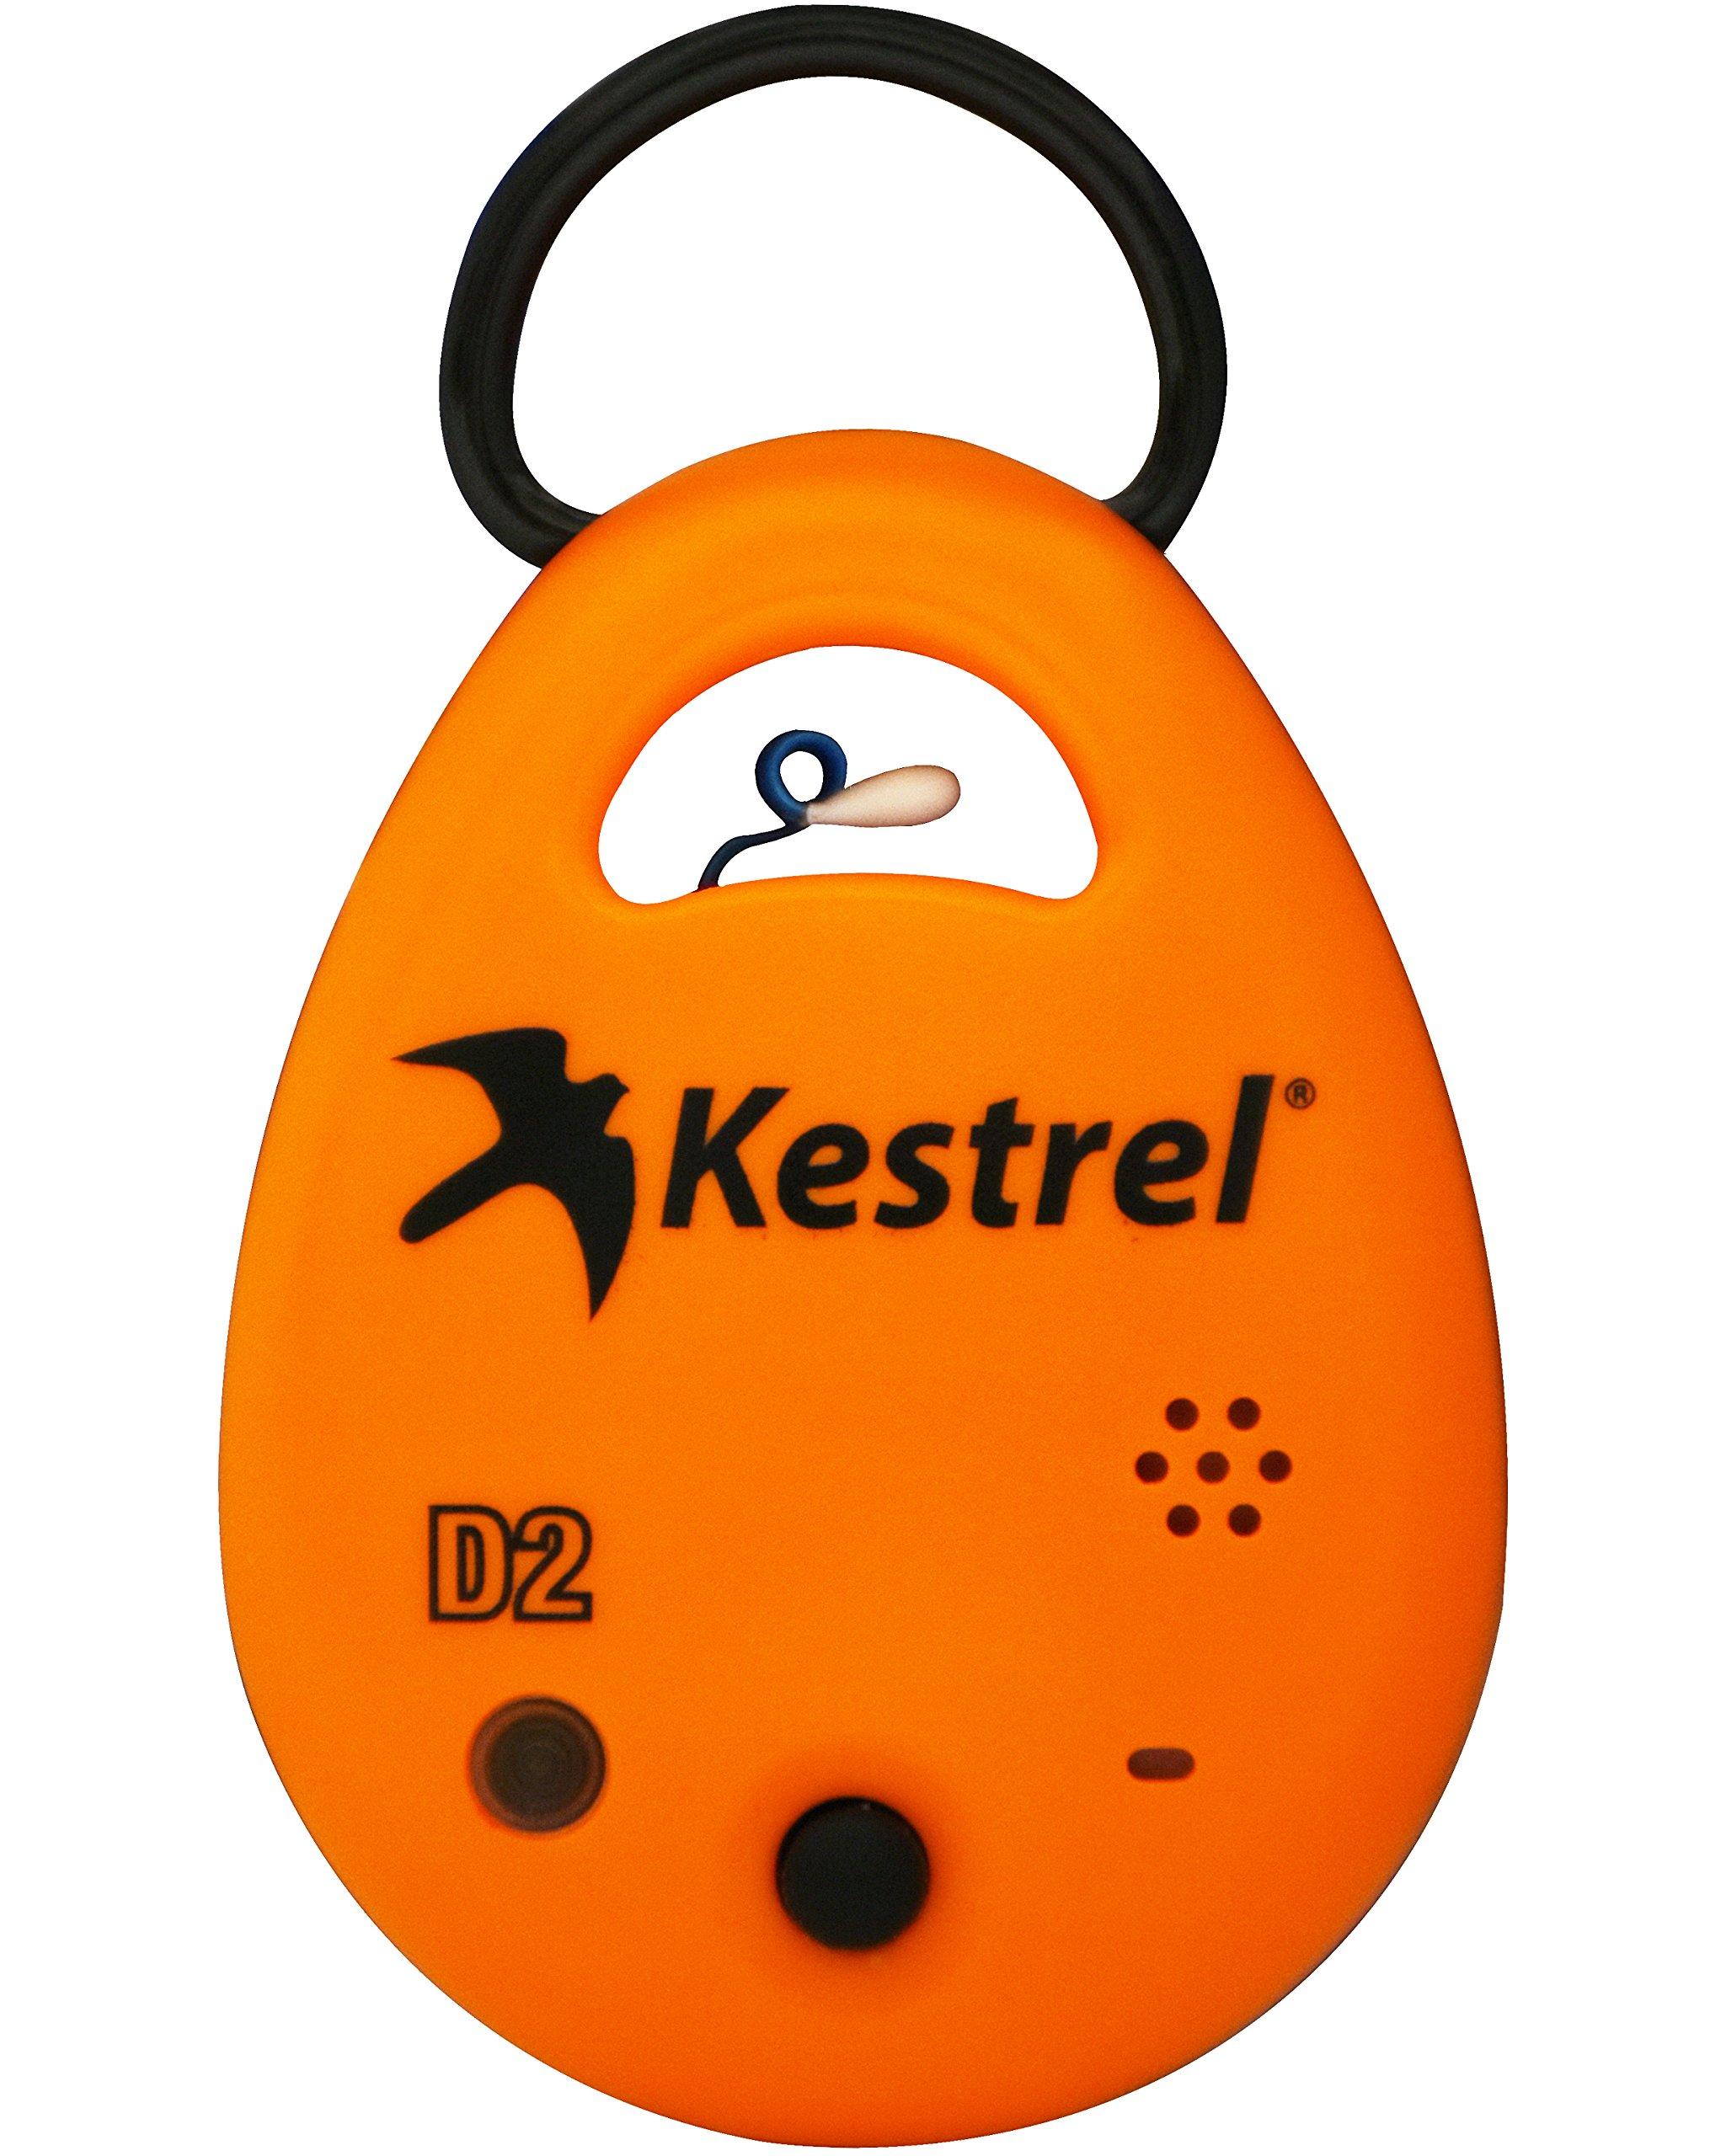 Kestrel Drop D2 Wireless Temperature Humidity Data Logger Orange by Kestrel